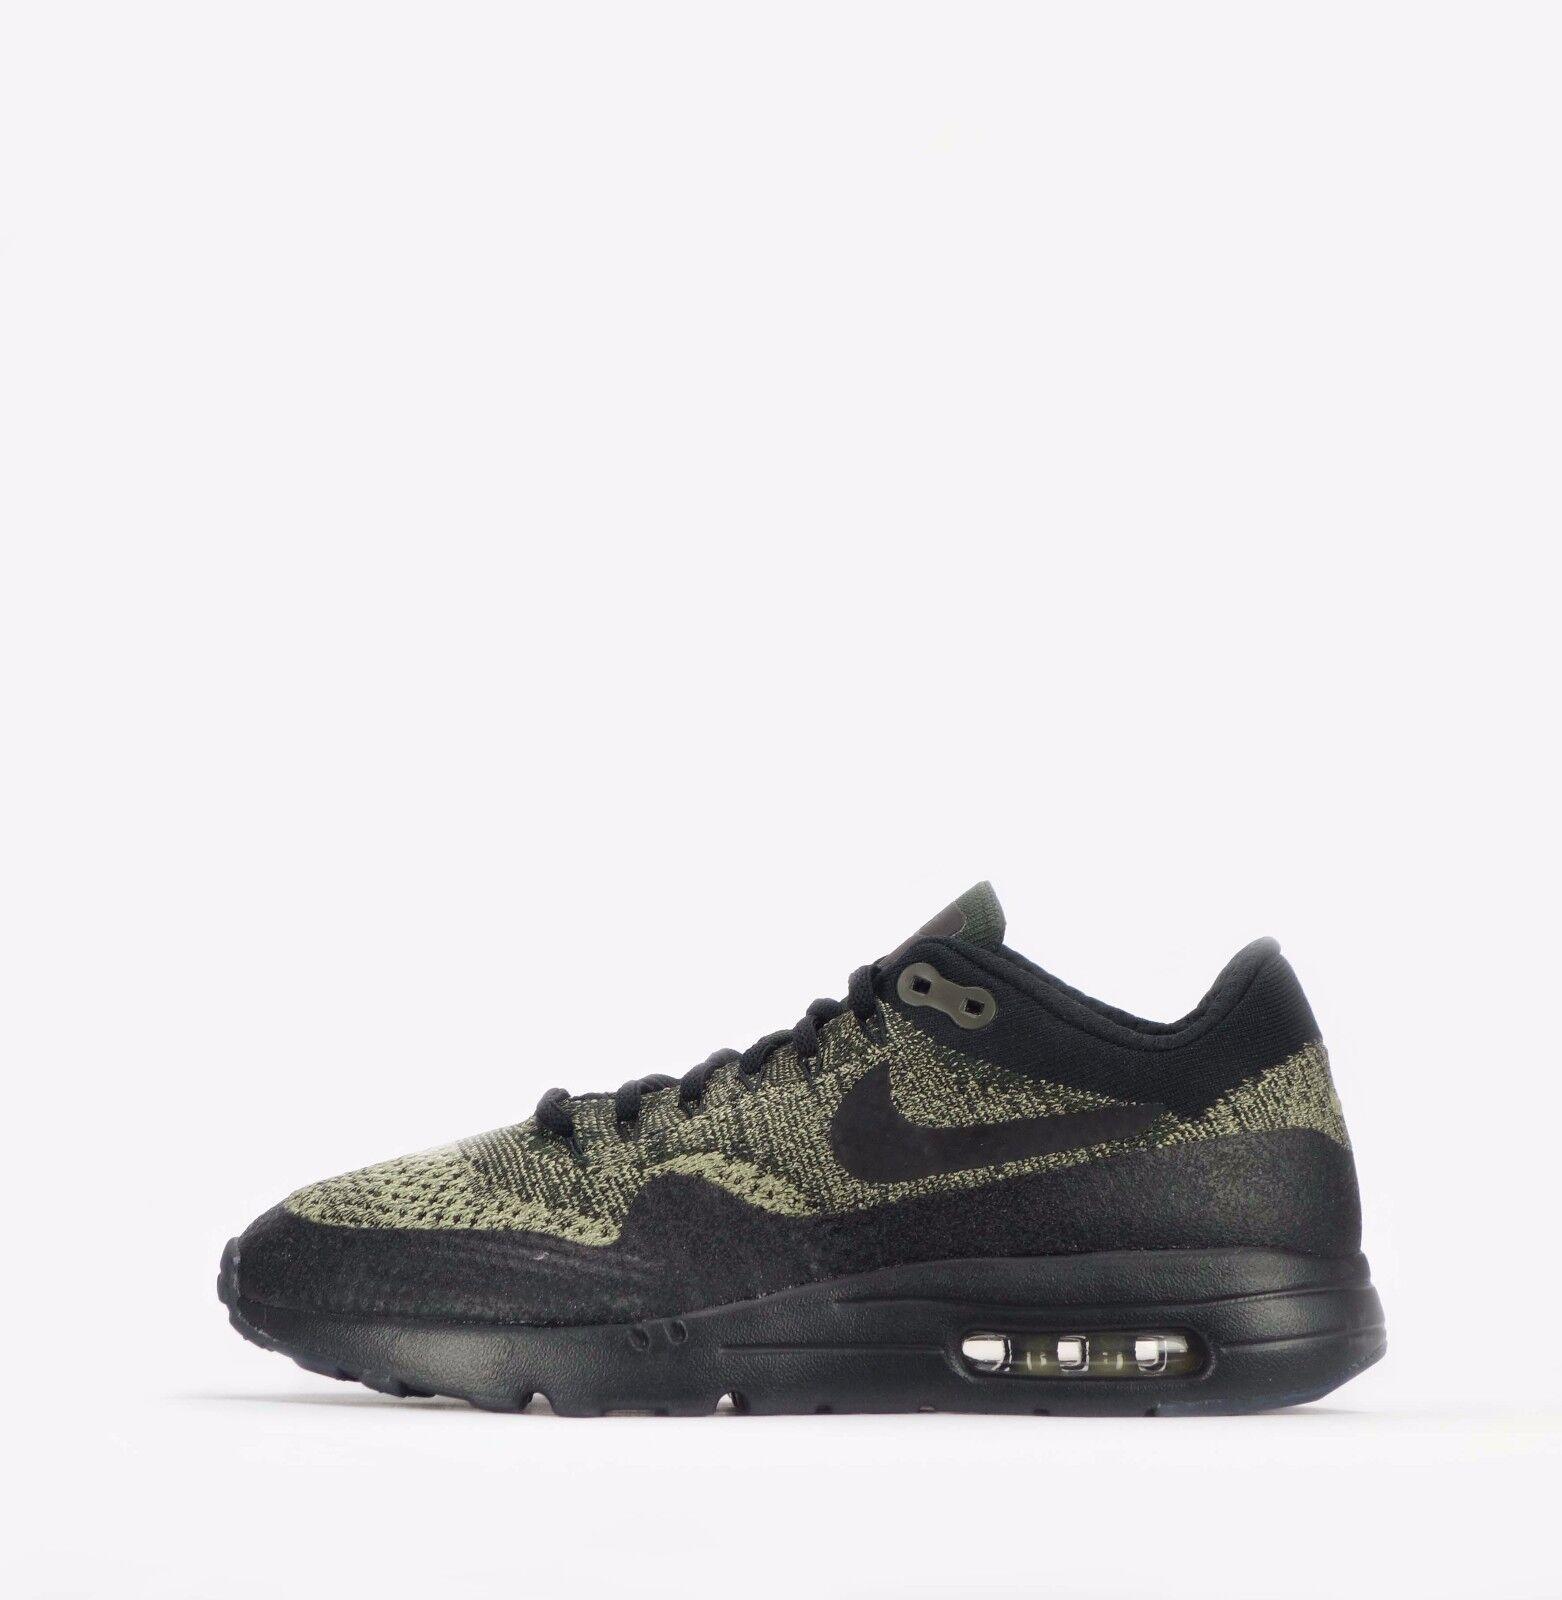 Nike Air Max 1 Ultra Flyknit Herren Schuhe in Neutral Olive schwarz